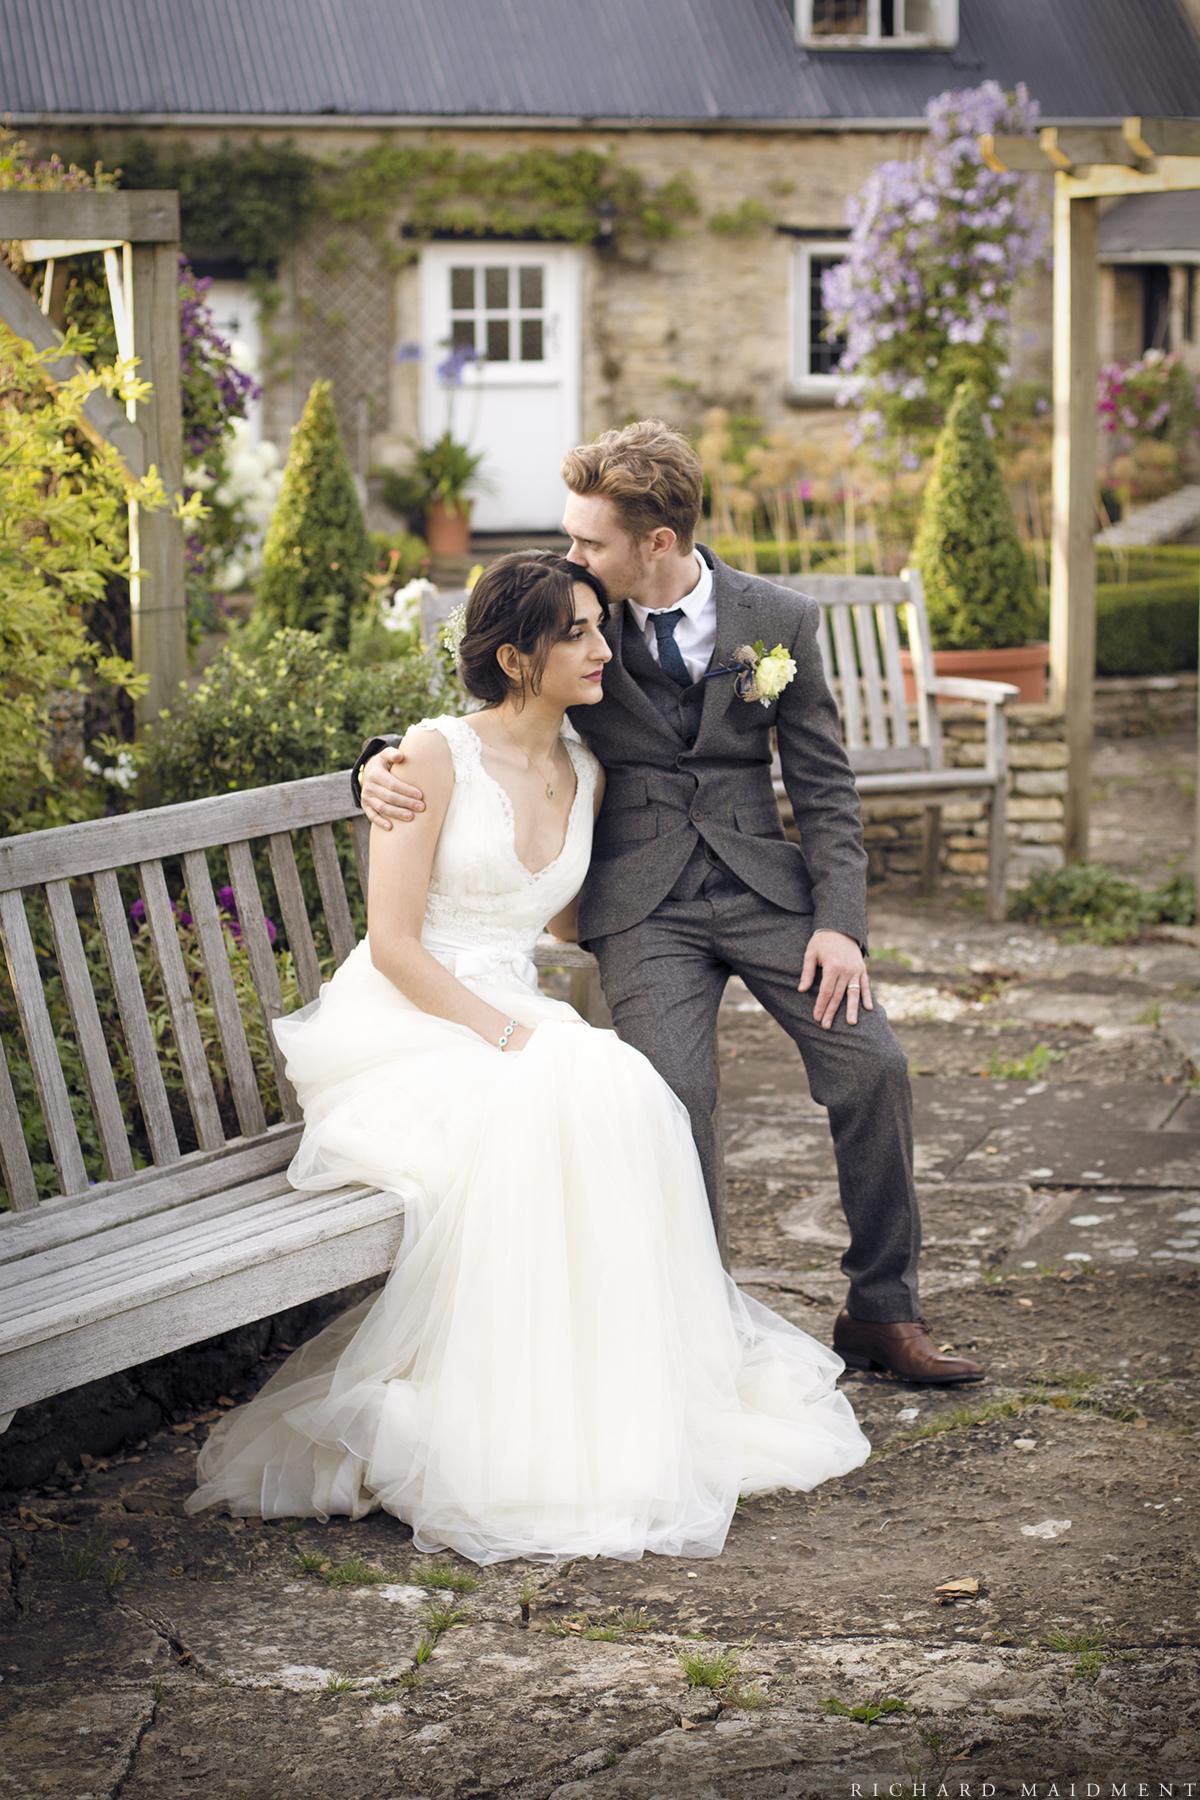 Richard Maidment - Wedding Photography (8).jpg